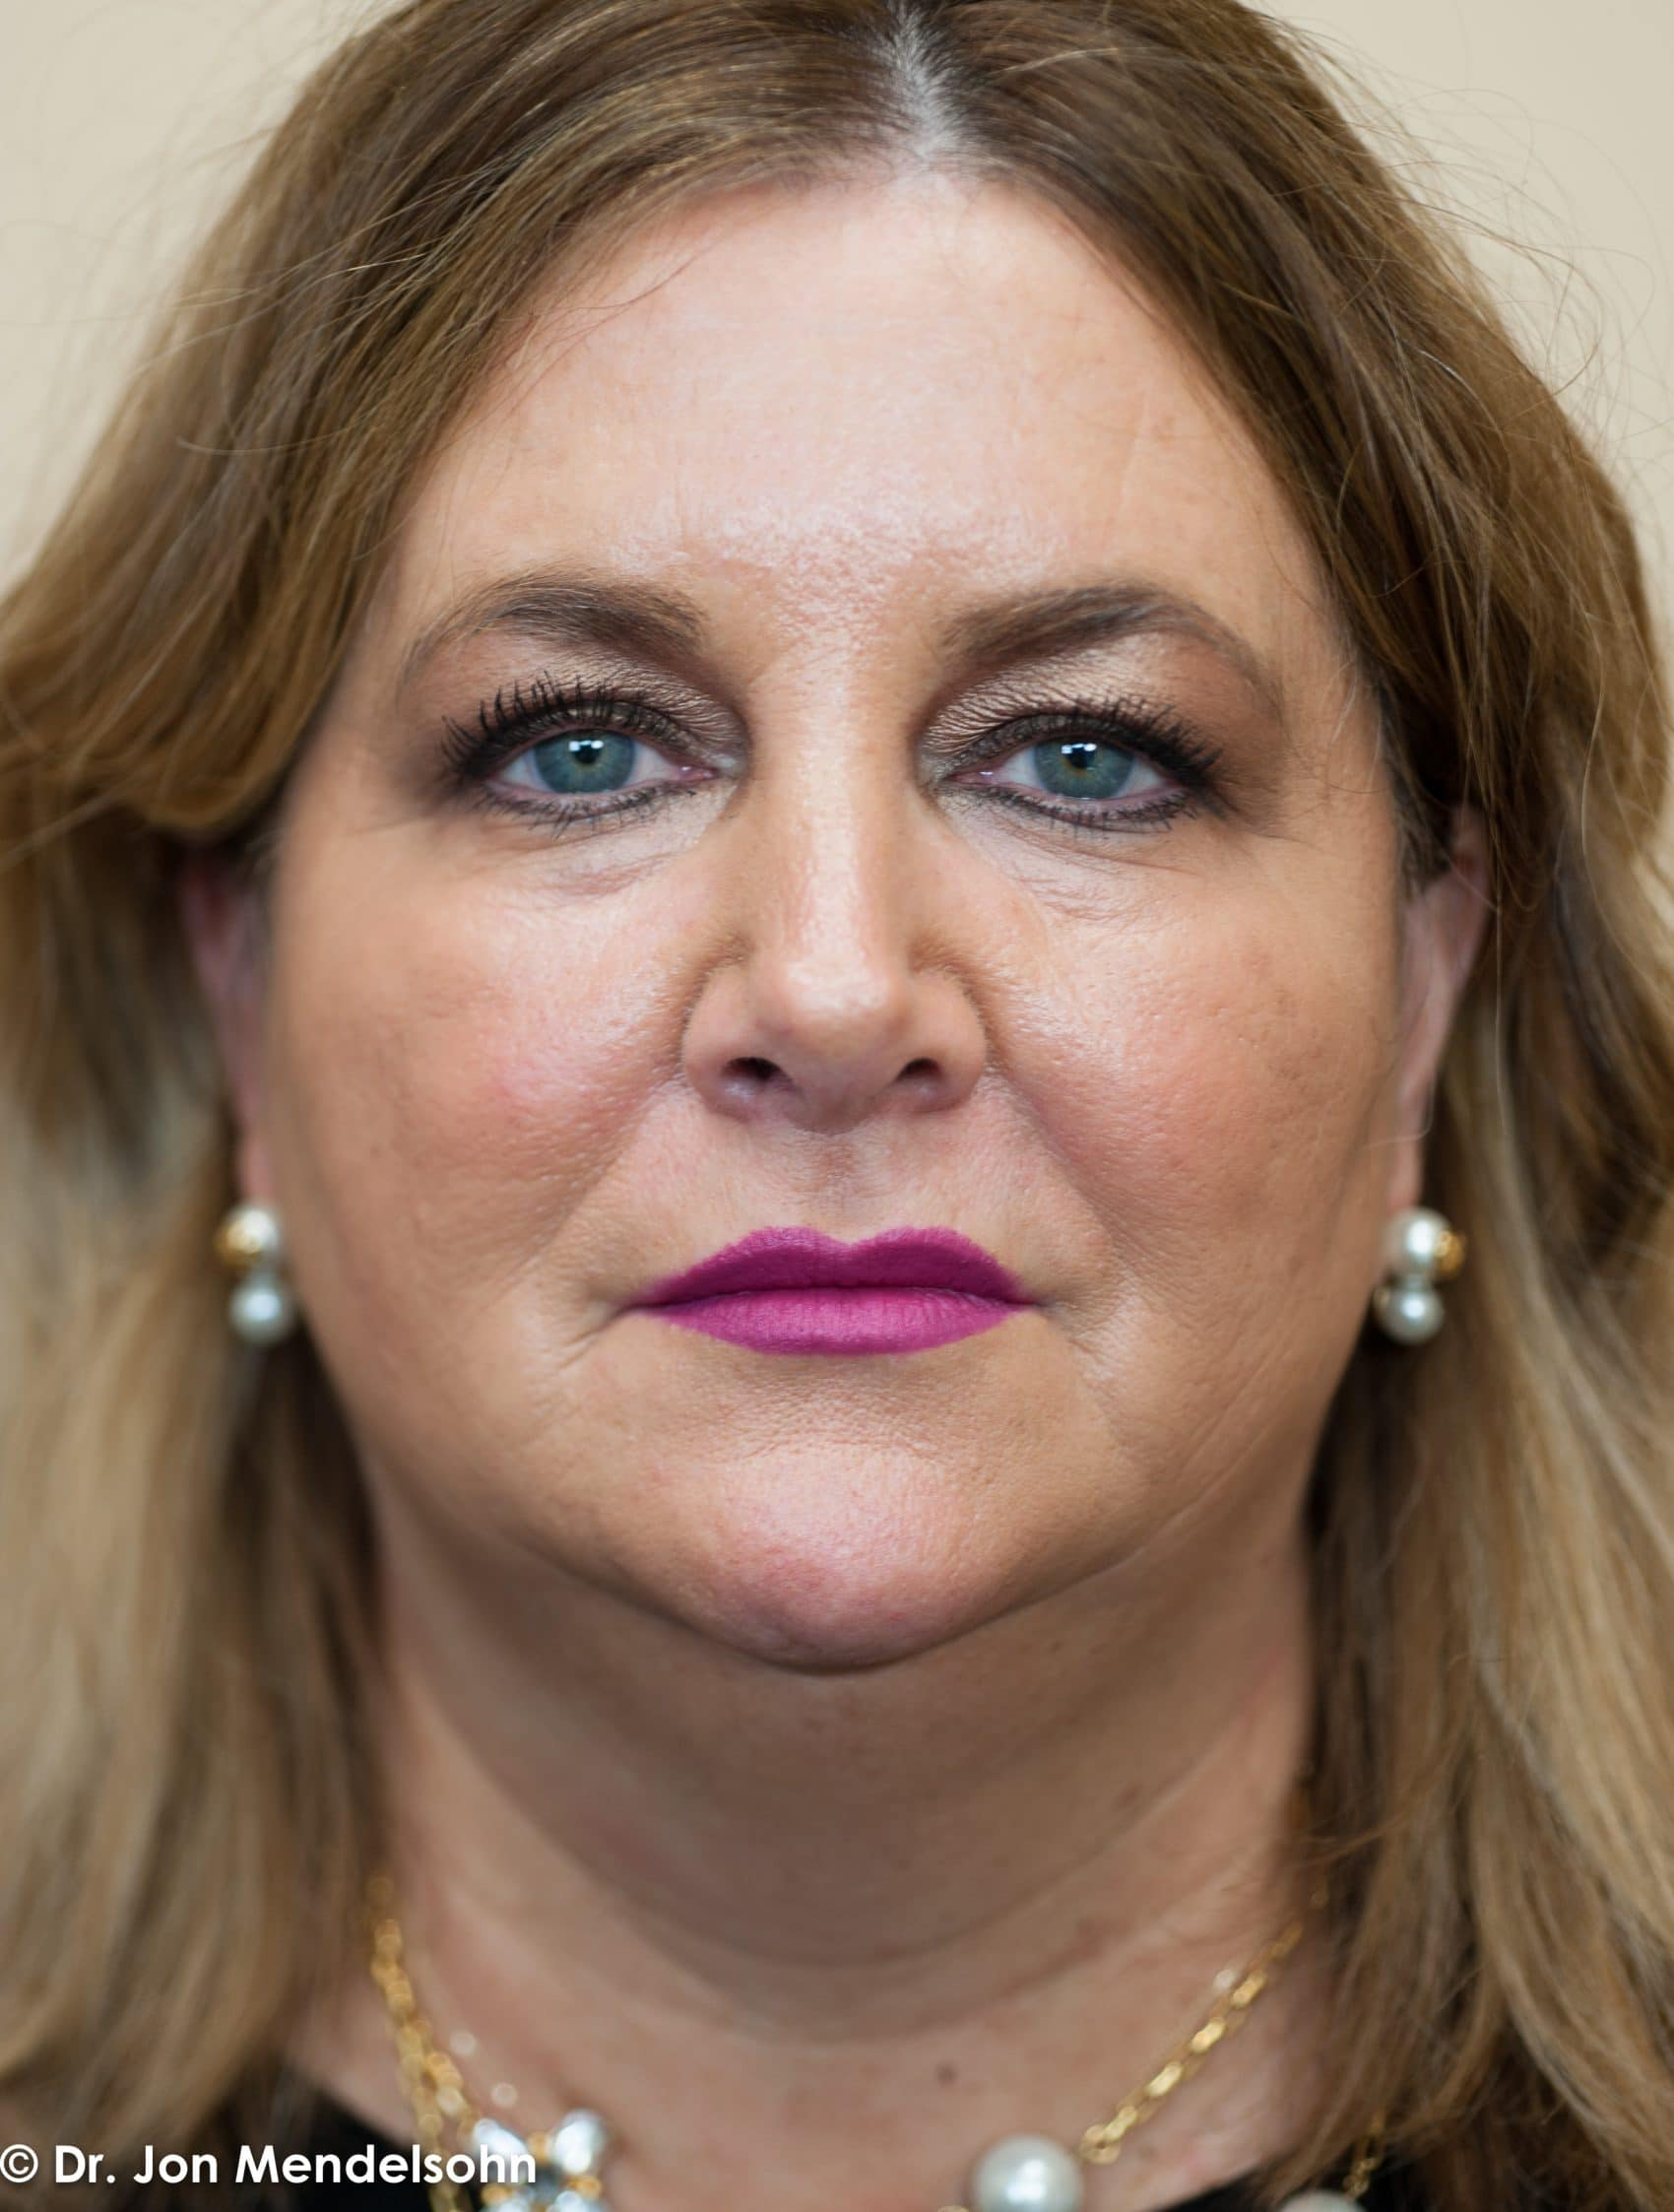 Upper-blepharoplasty-eyelid-surgery-cincinnati-dr-jon-mendelsohn-best-eyelid-surgery-plastic-surgery-realself-truseselfies-frontal-before-Burke_Jill-13995-2